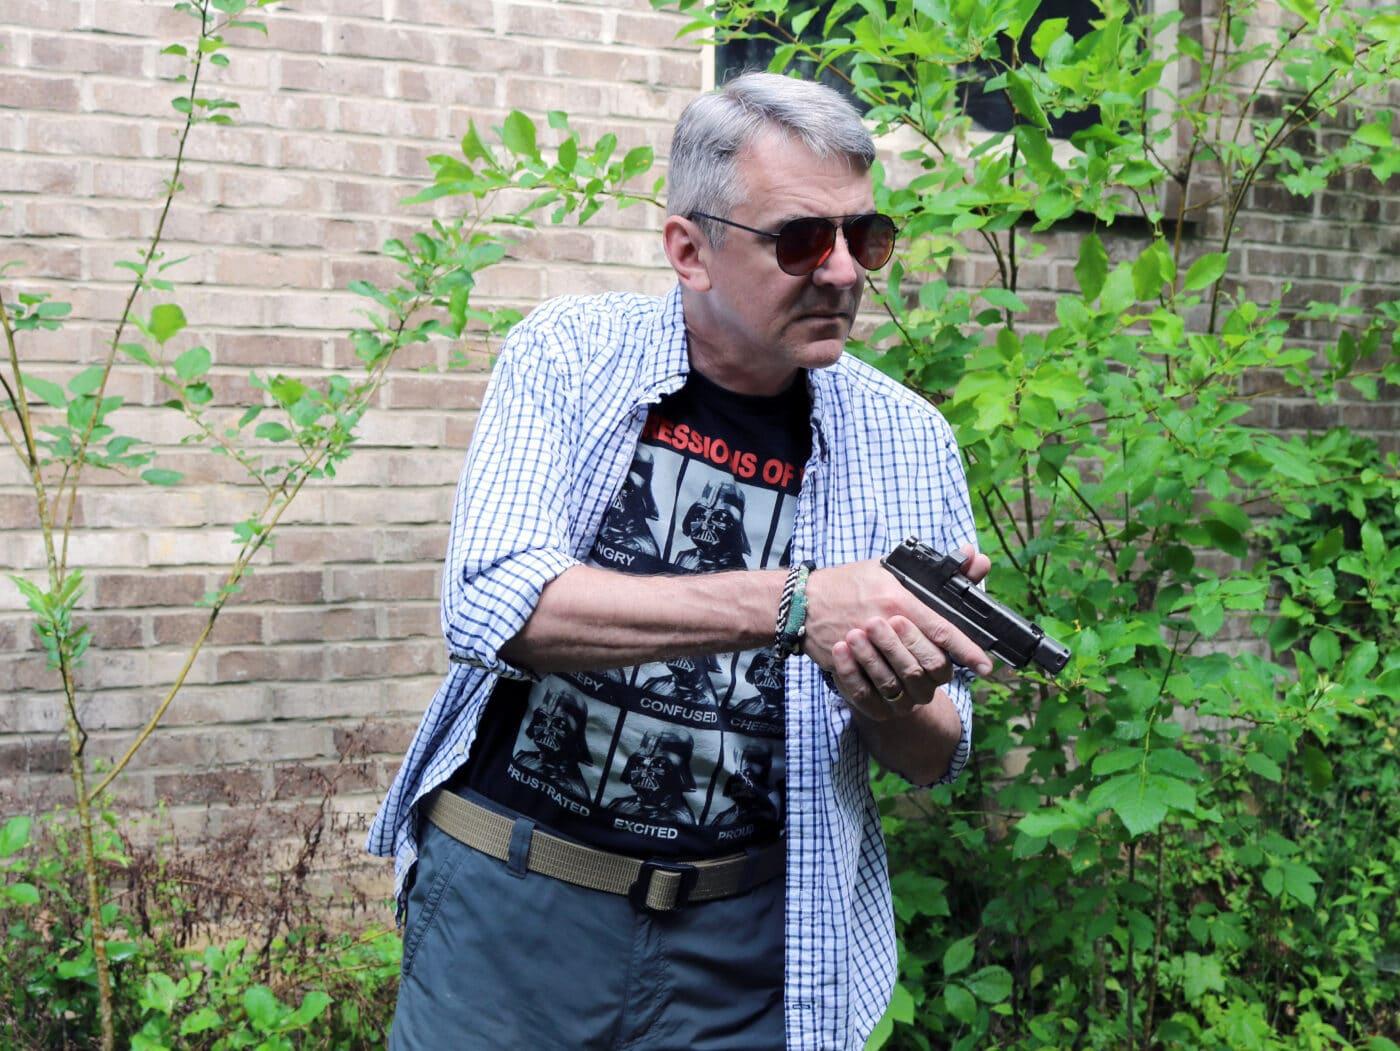 Man holding Springfield Armory Hellcat RDP pistol and using DeSantis holster